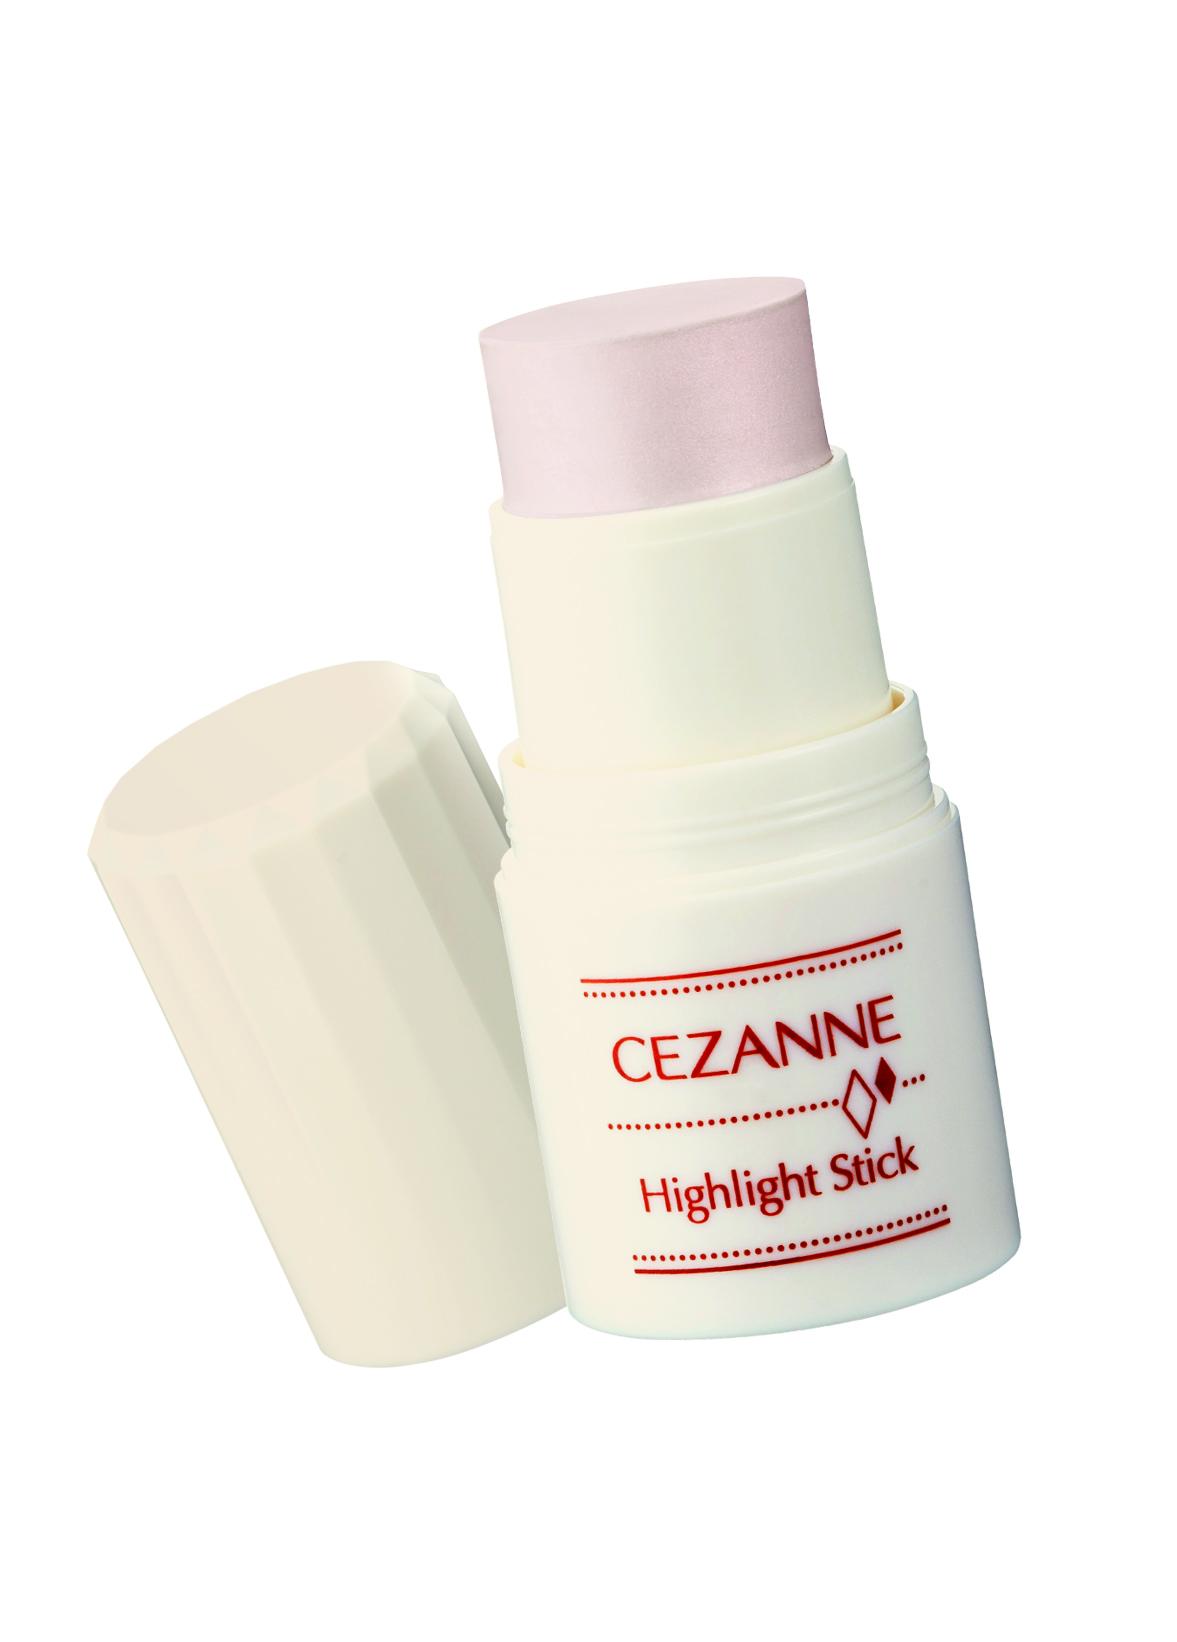 Cezanne Cezanne Highlight Stick